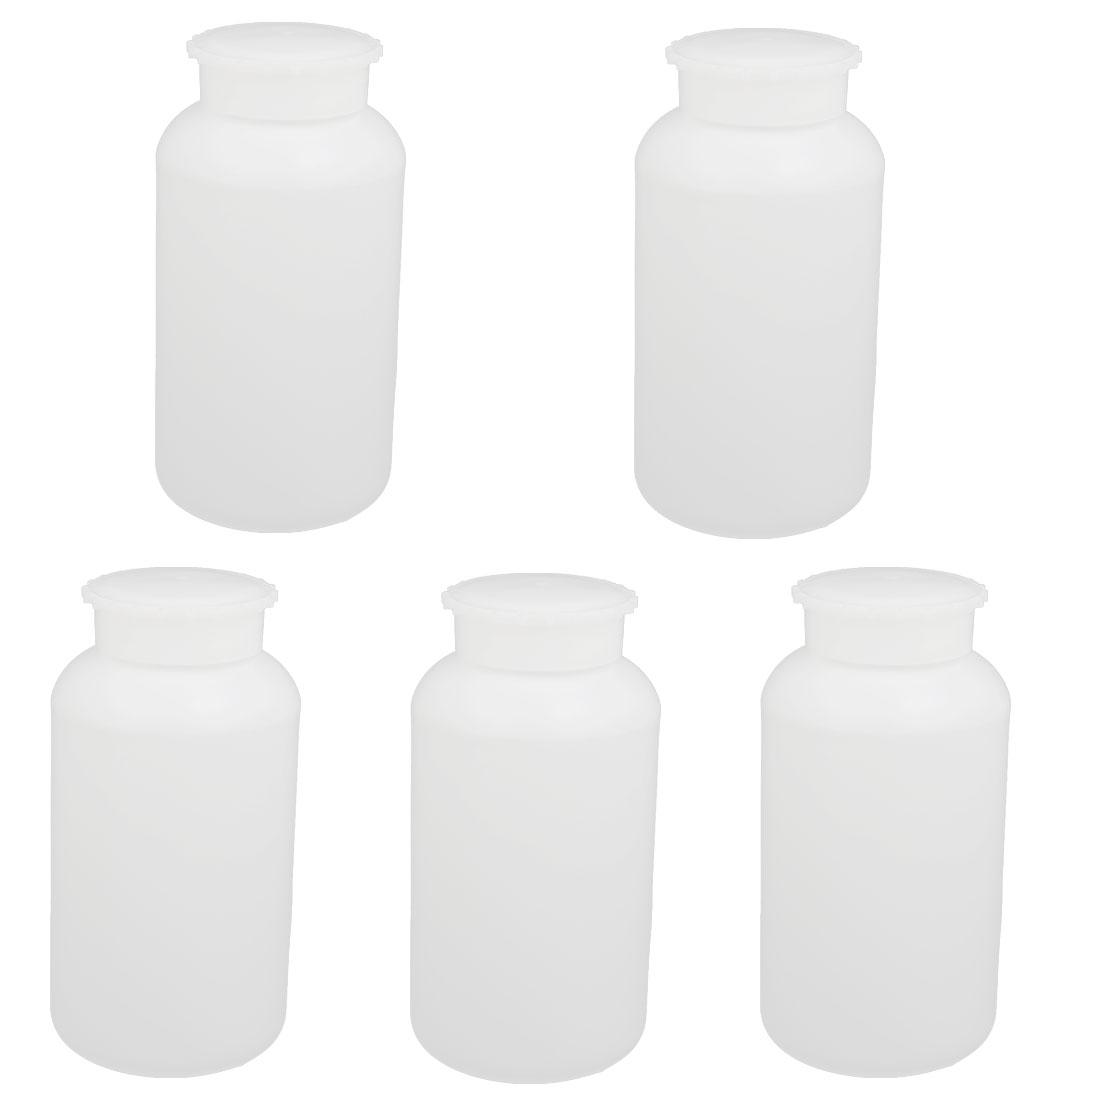 5pcs 1000ml Plastic Wide Mouth Round Laboratory Reagent Sample Bottle White